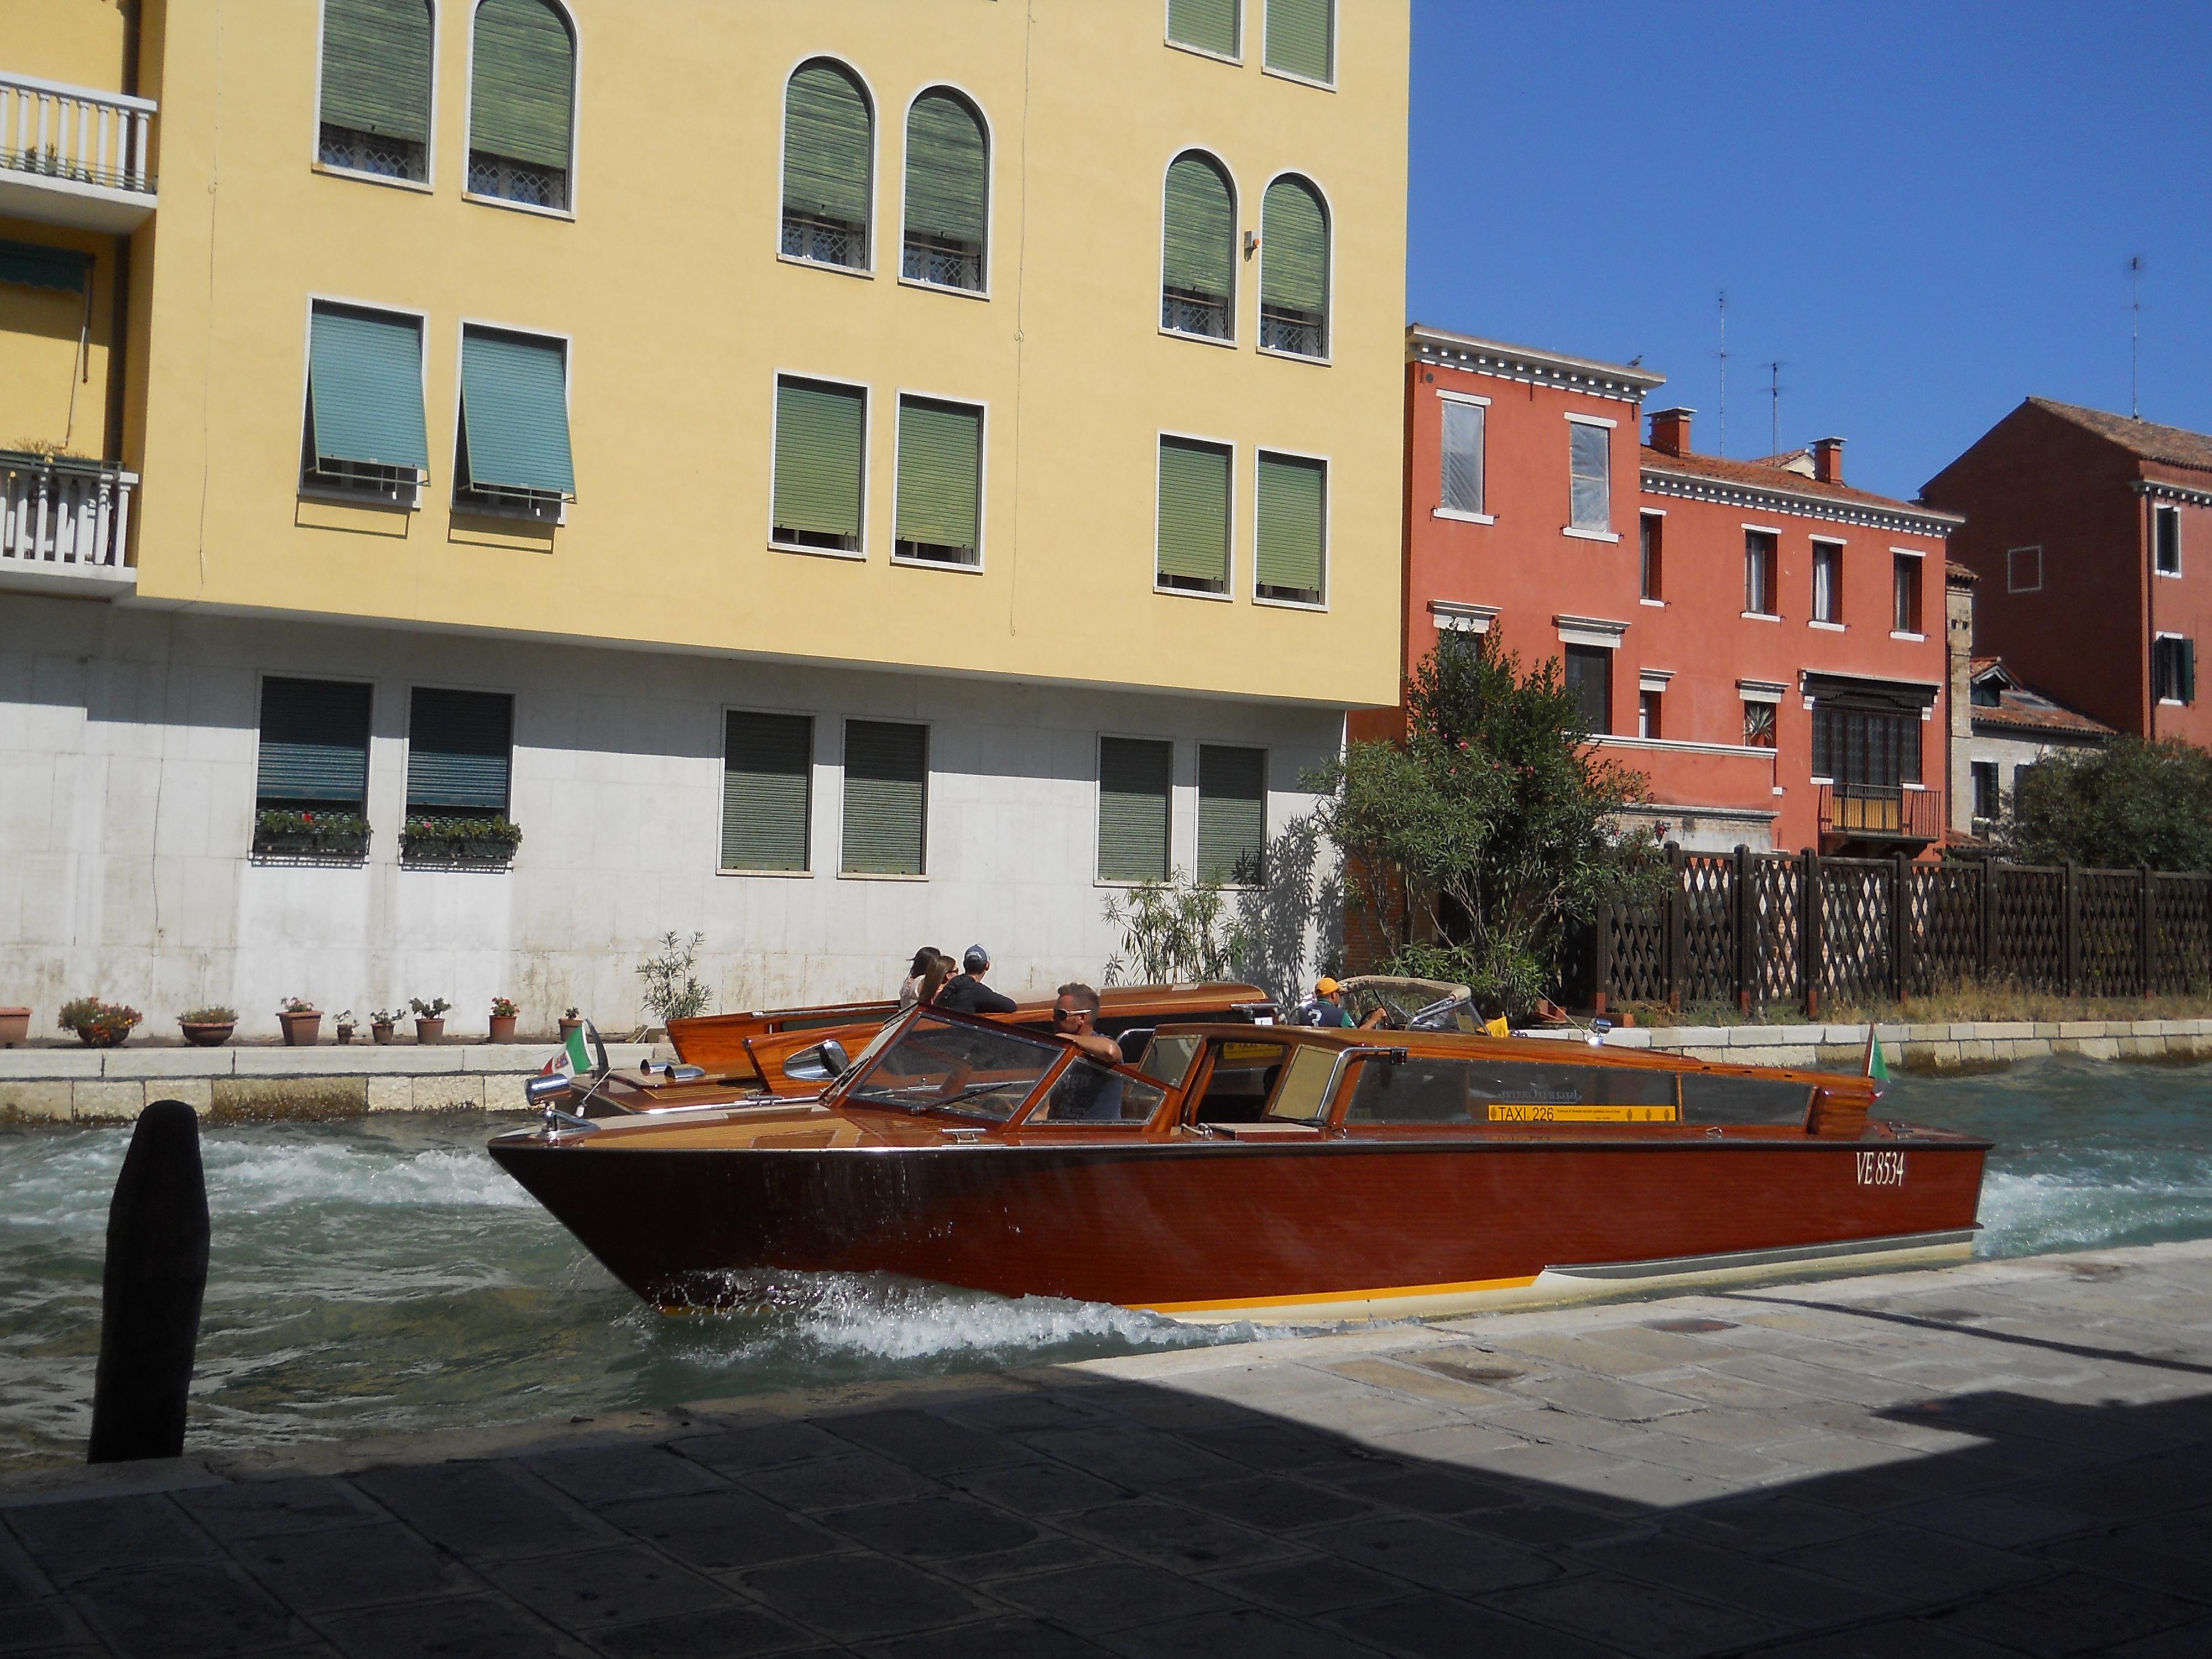 Venecia Water Taxi